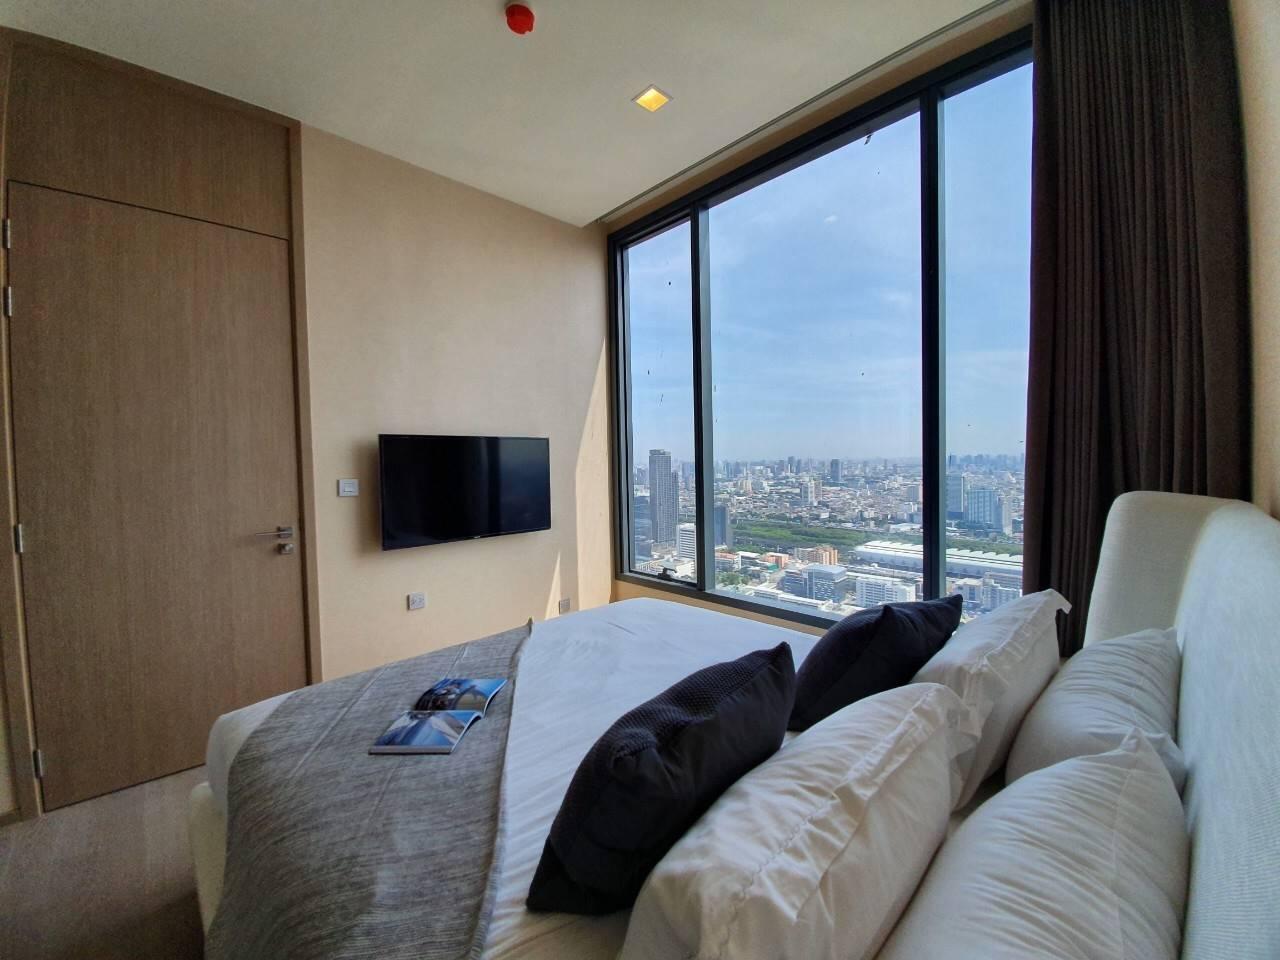 Bangkok Property Condo Apartment Real Estate For Sale in Asok Sukhumvit High-rise in Asok